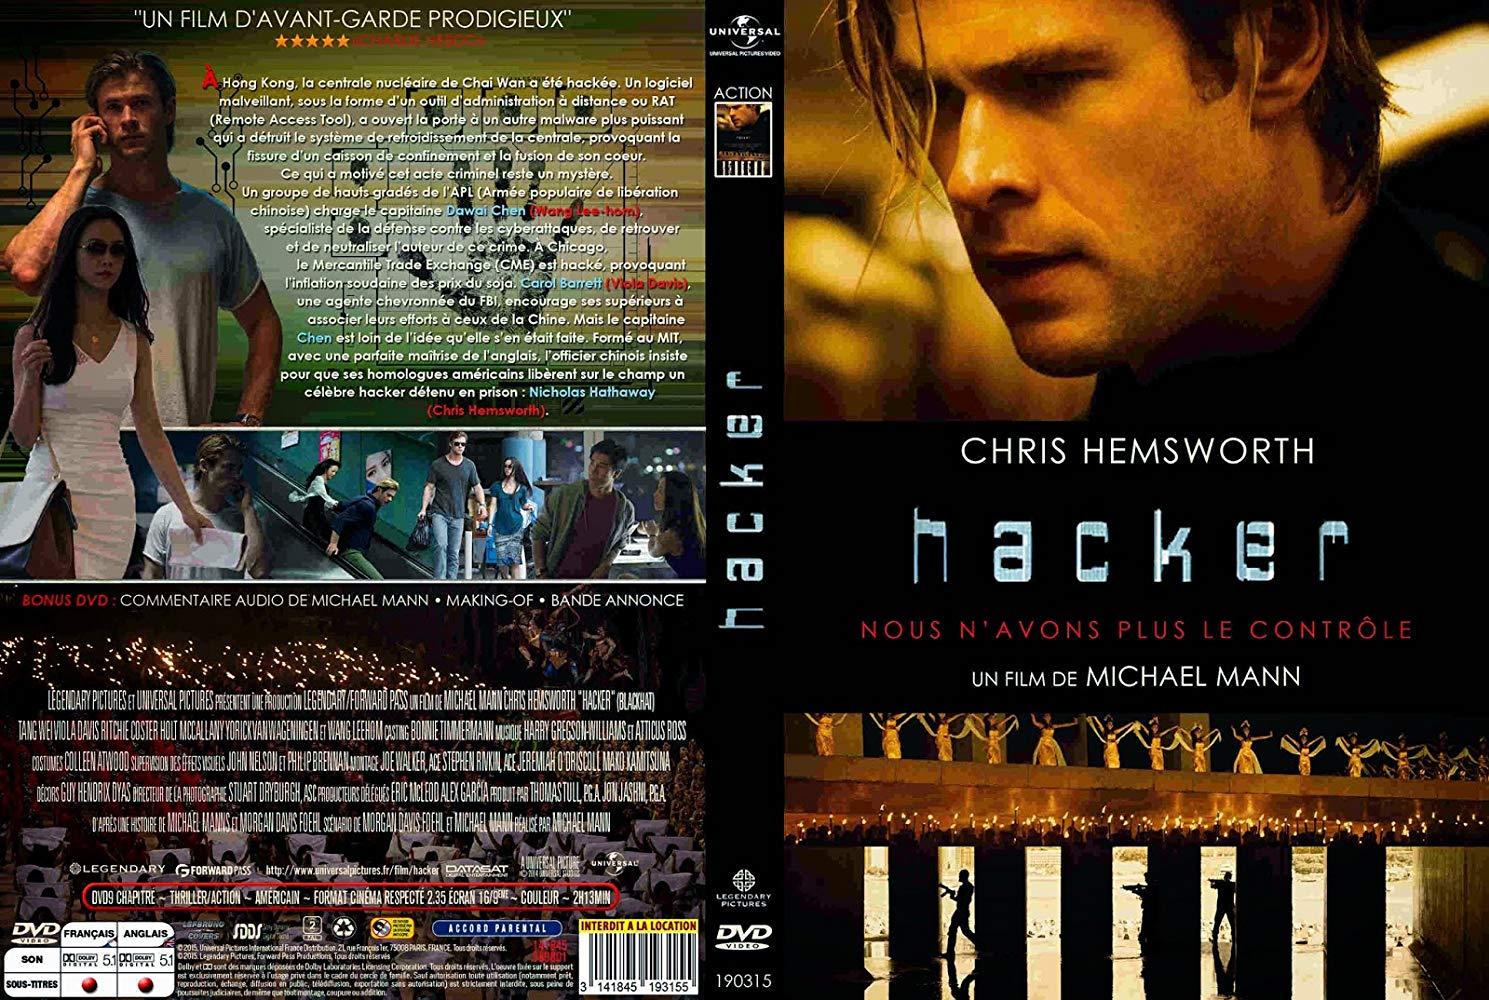 blackhat movie shot in jakarta indonesia